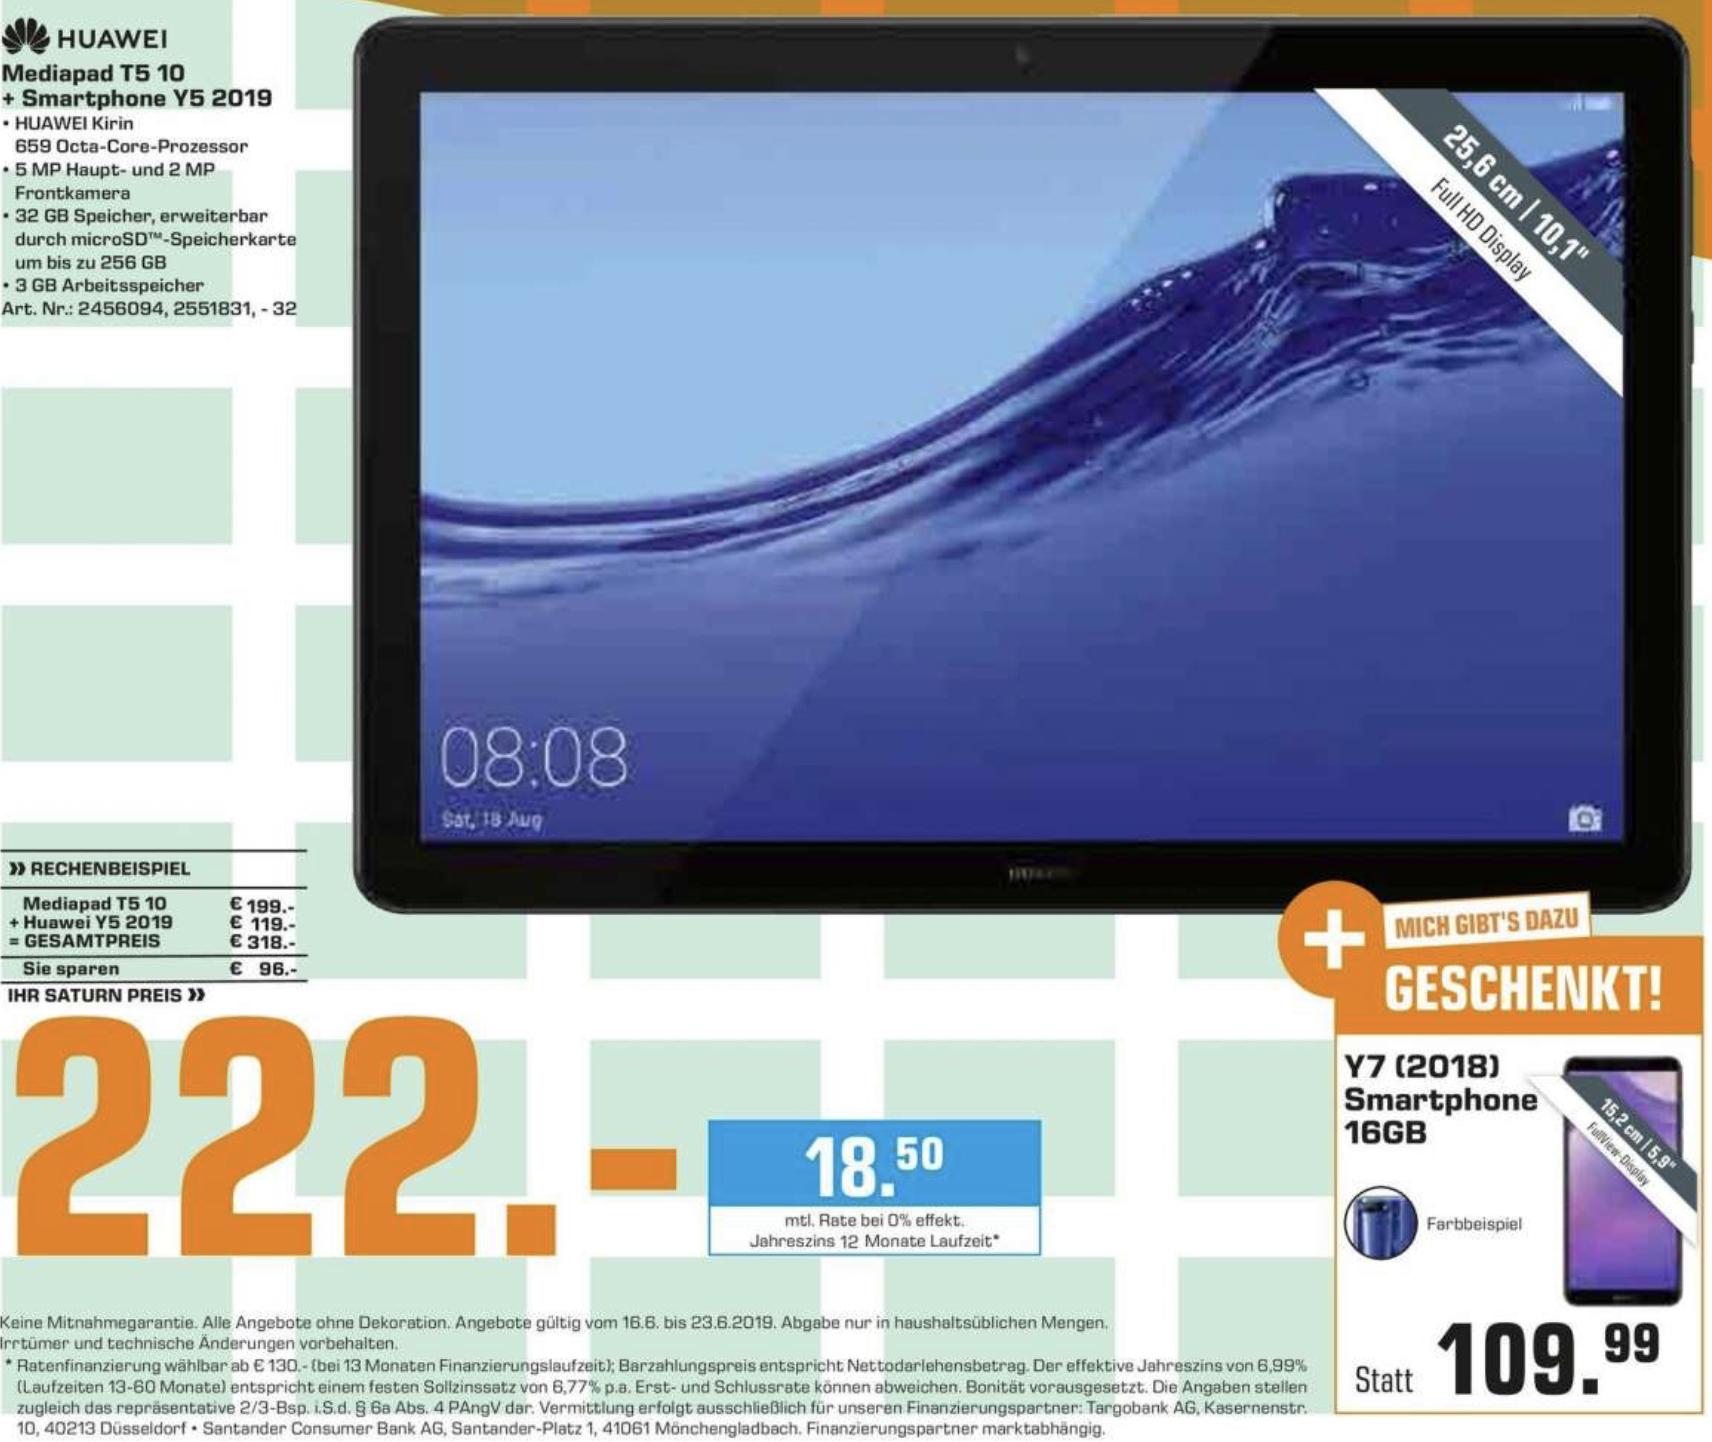 Lokal Saturn Berlin: Huawei Medipad T5 10 32GB + Smartphone Y5 2019 16GB für zusammen 222€